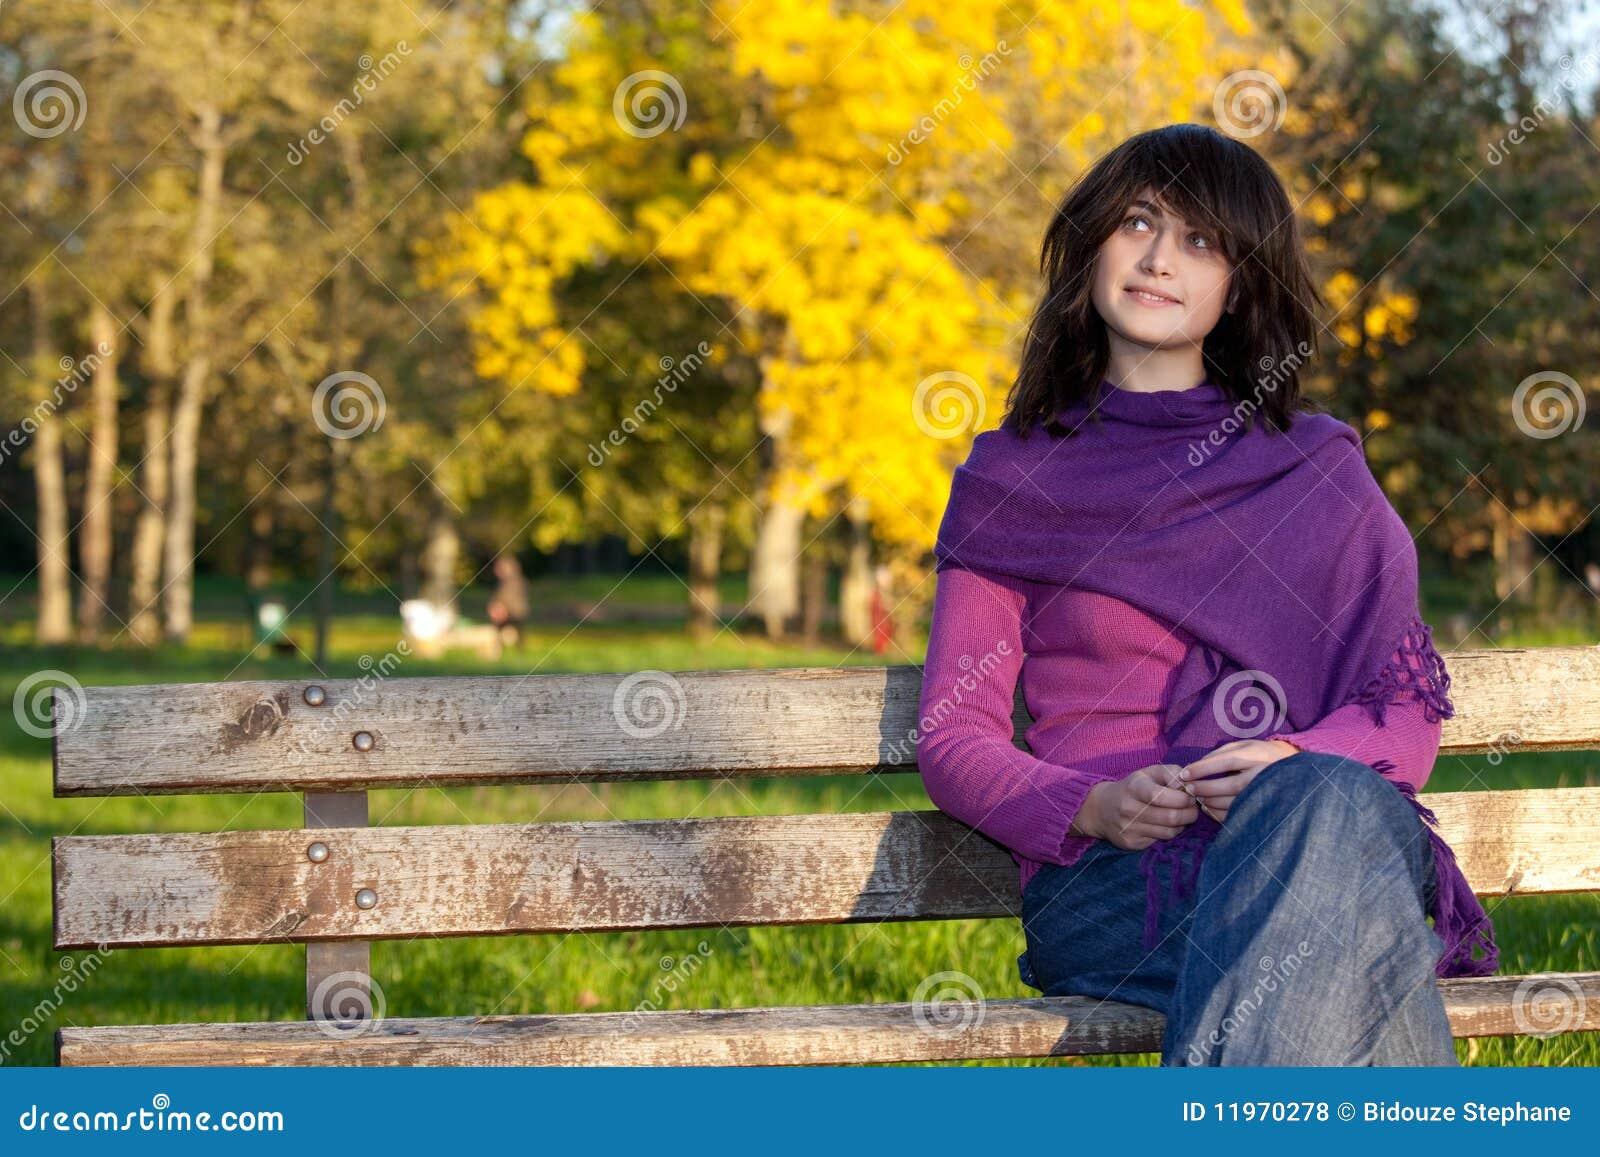 Frauen suchen männer cedar falls